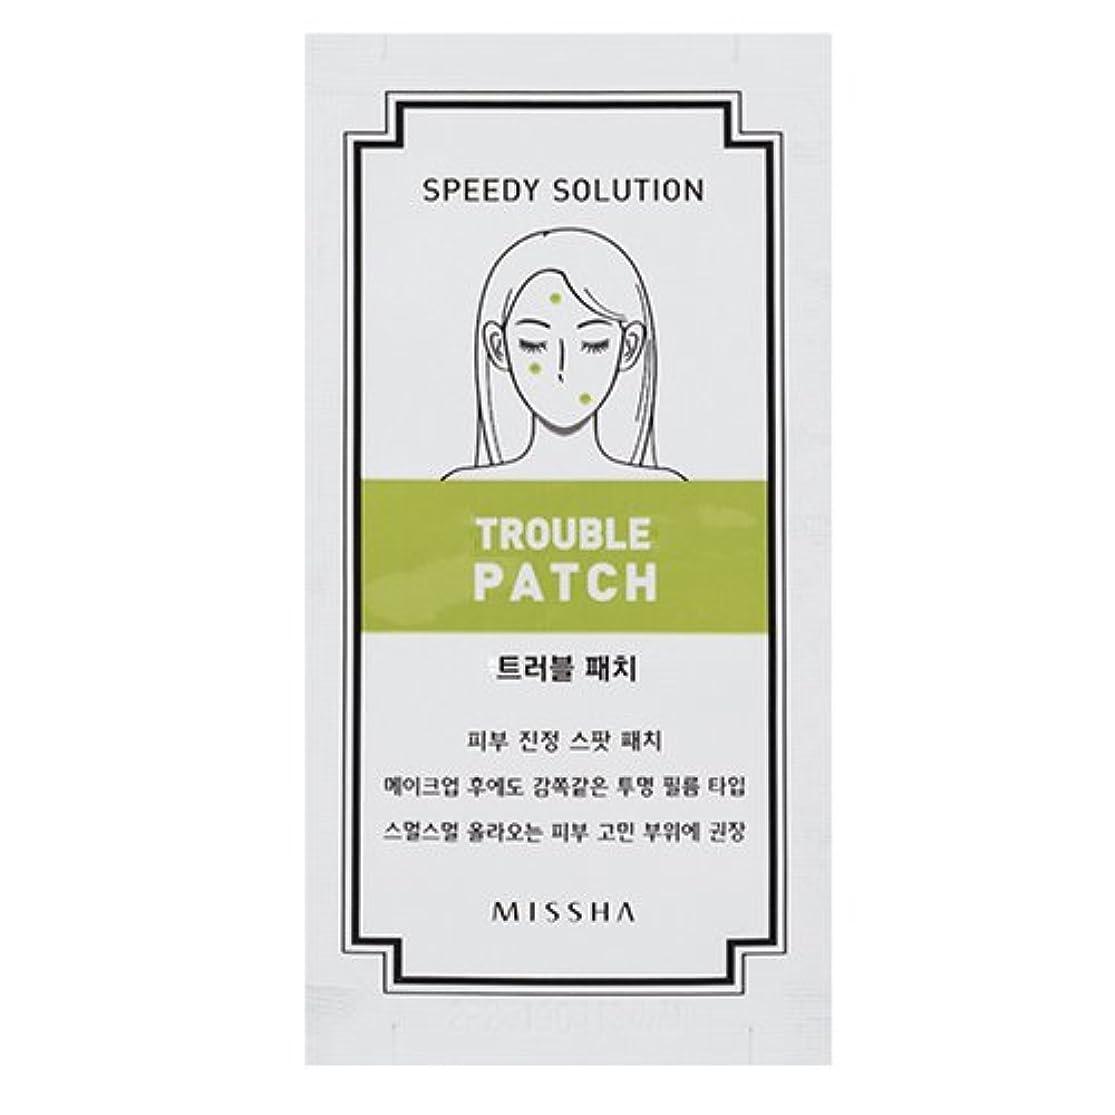 MISSHA Speedy Solution Anti Trouble Patch 5Sheets/ミシャ スピーディー ソリューション アンチ トラブル パッチ 5枚 [並行輸入品]